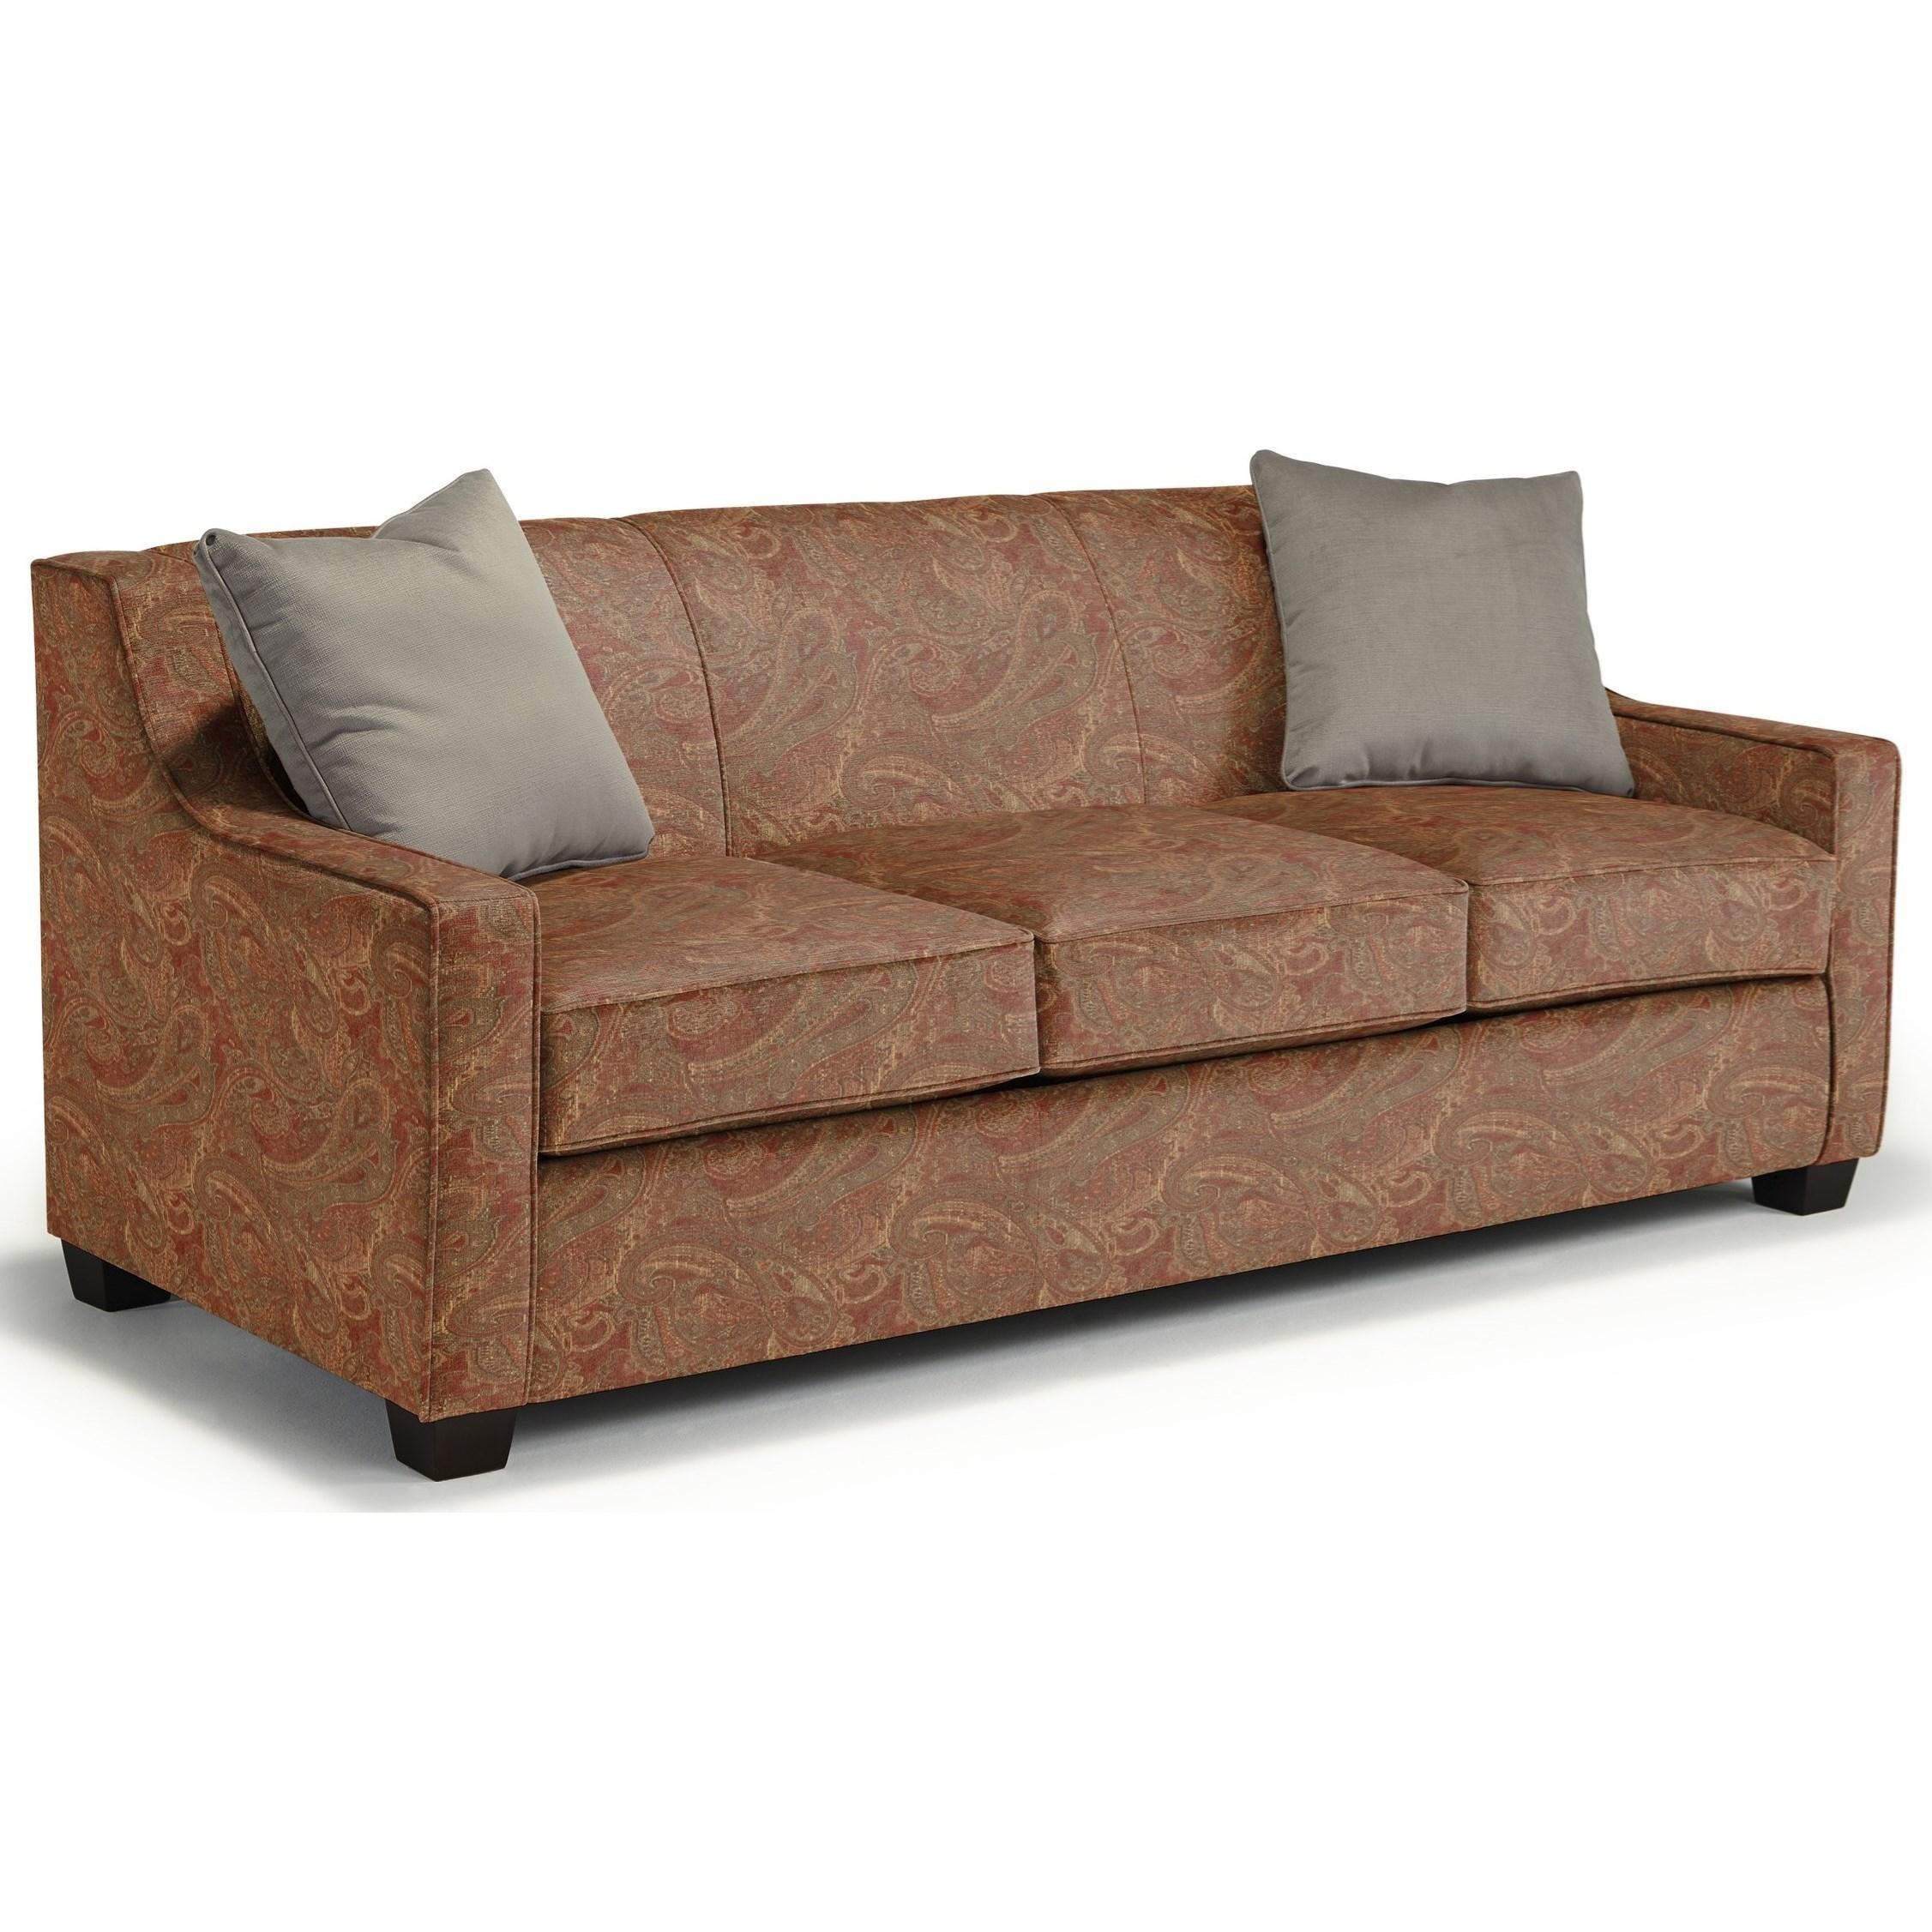 Marinette Queen Sleeper by Best Home Furnishings at Best Home Furnishings